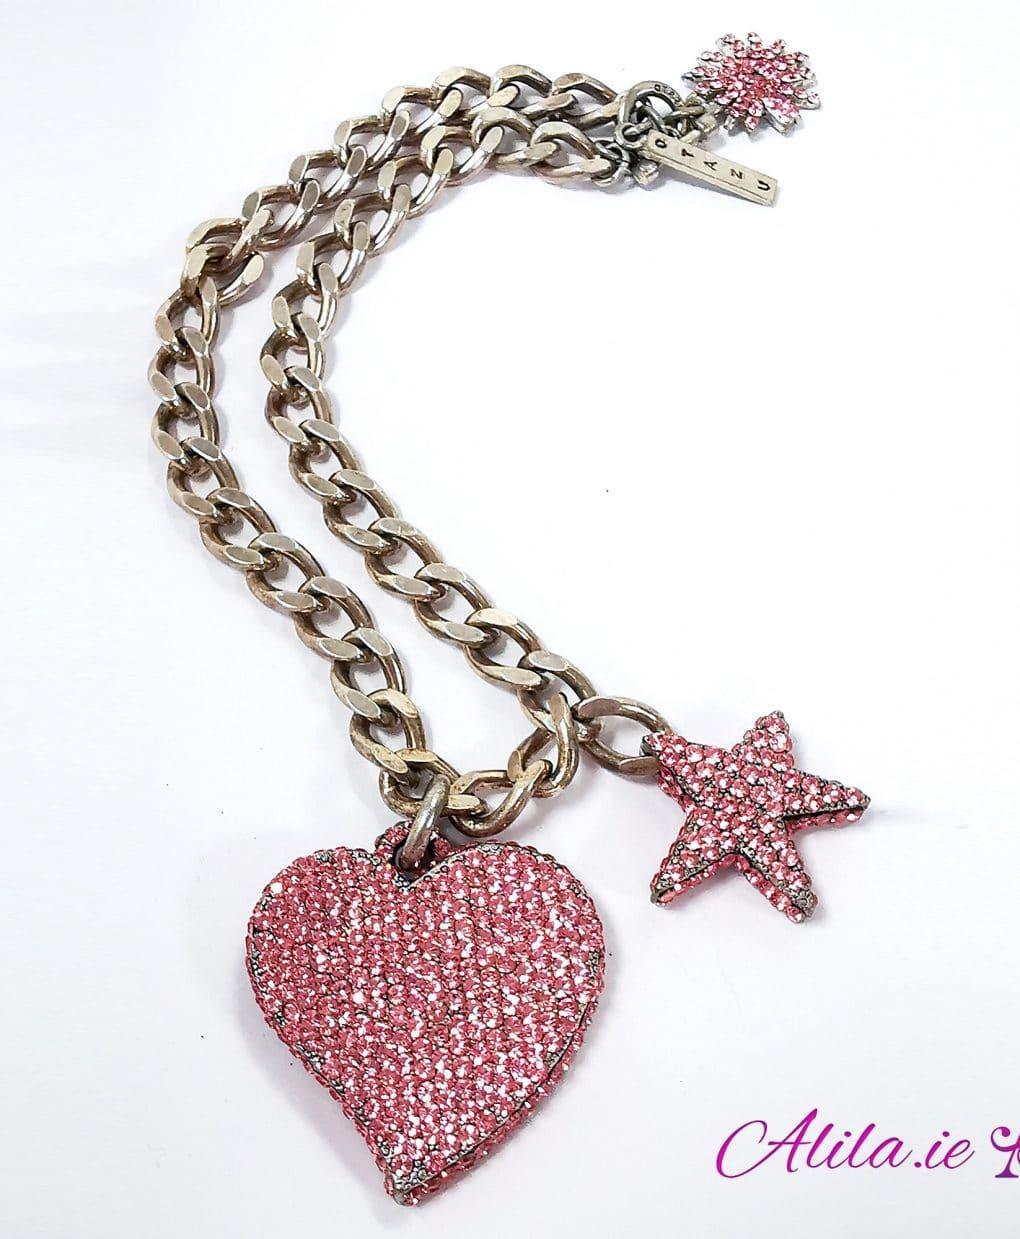 Otazu-Pink-SWAROVKSI-Crystal-Heart-star-necklace-Alila-Ireland